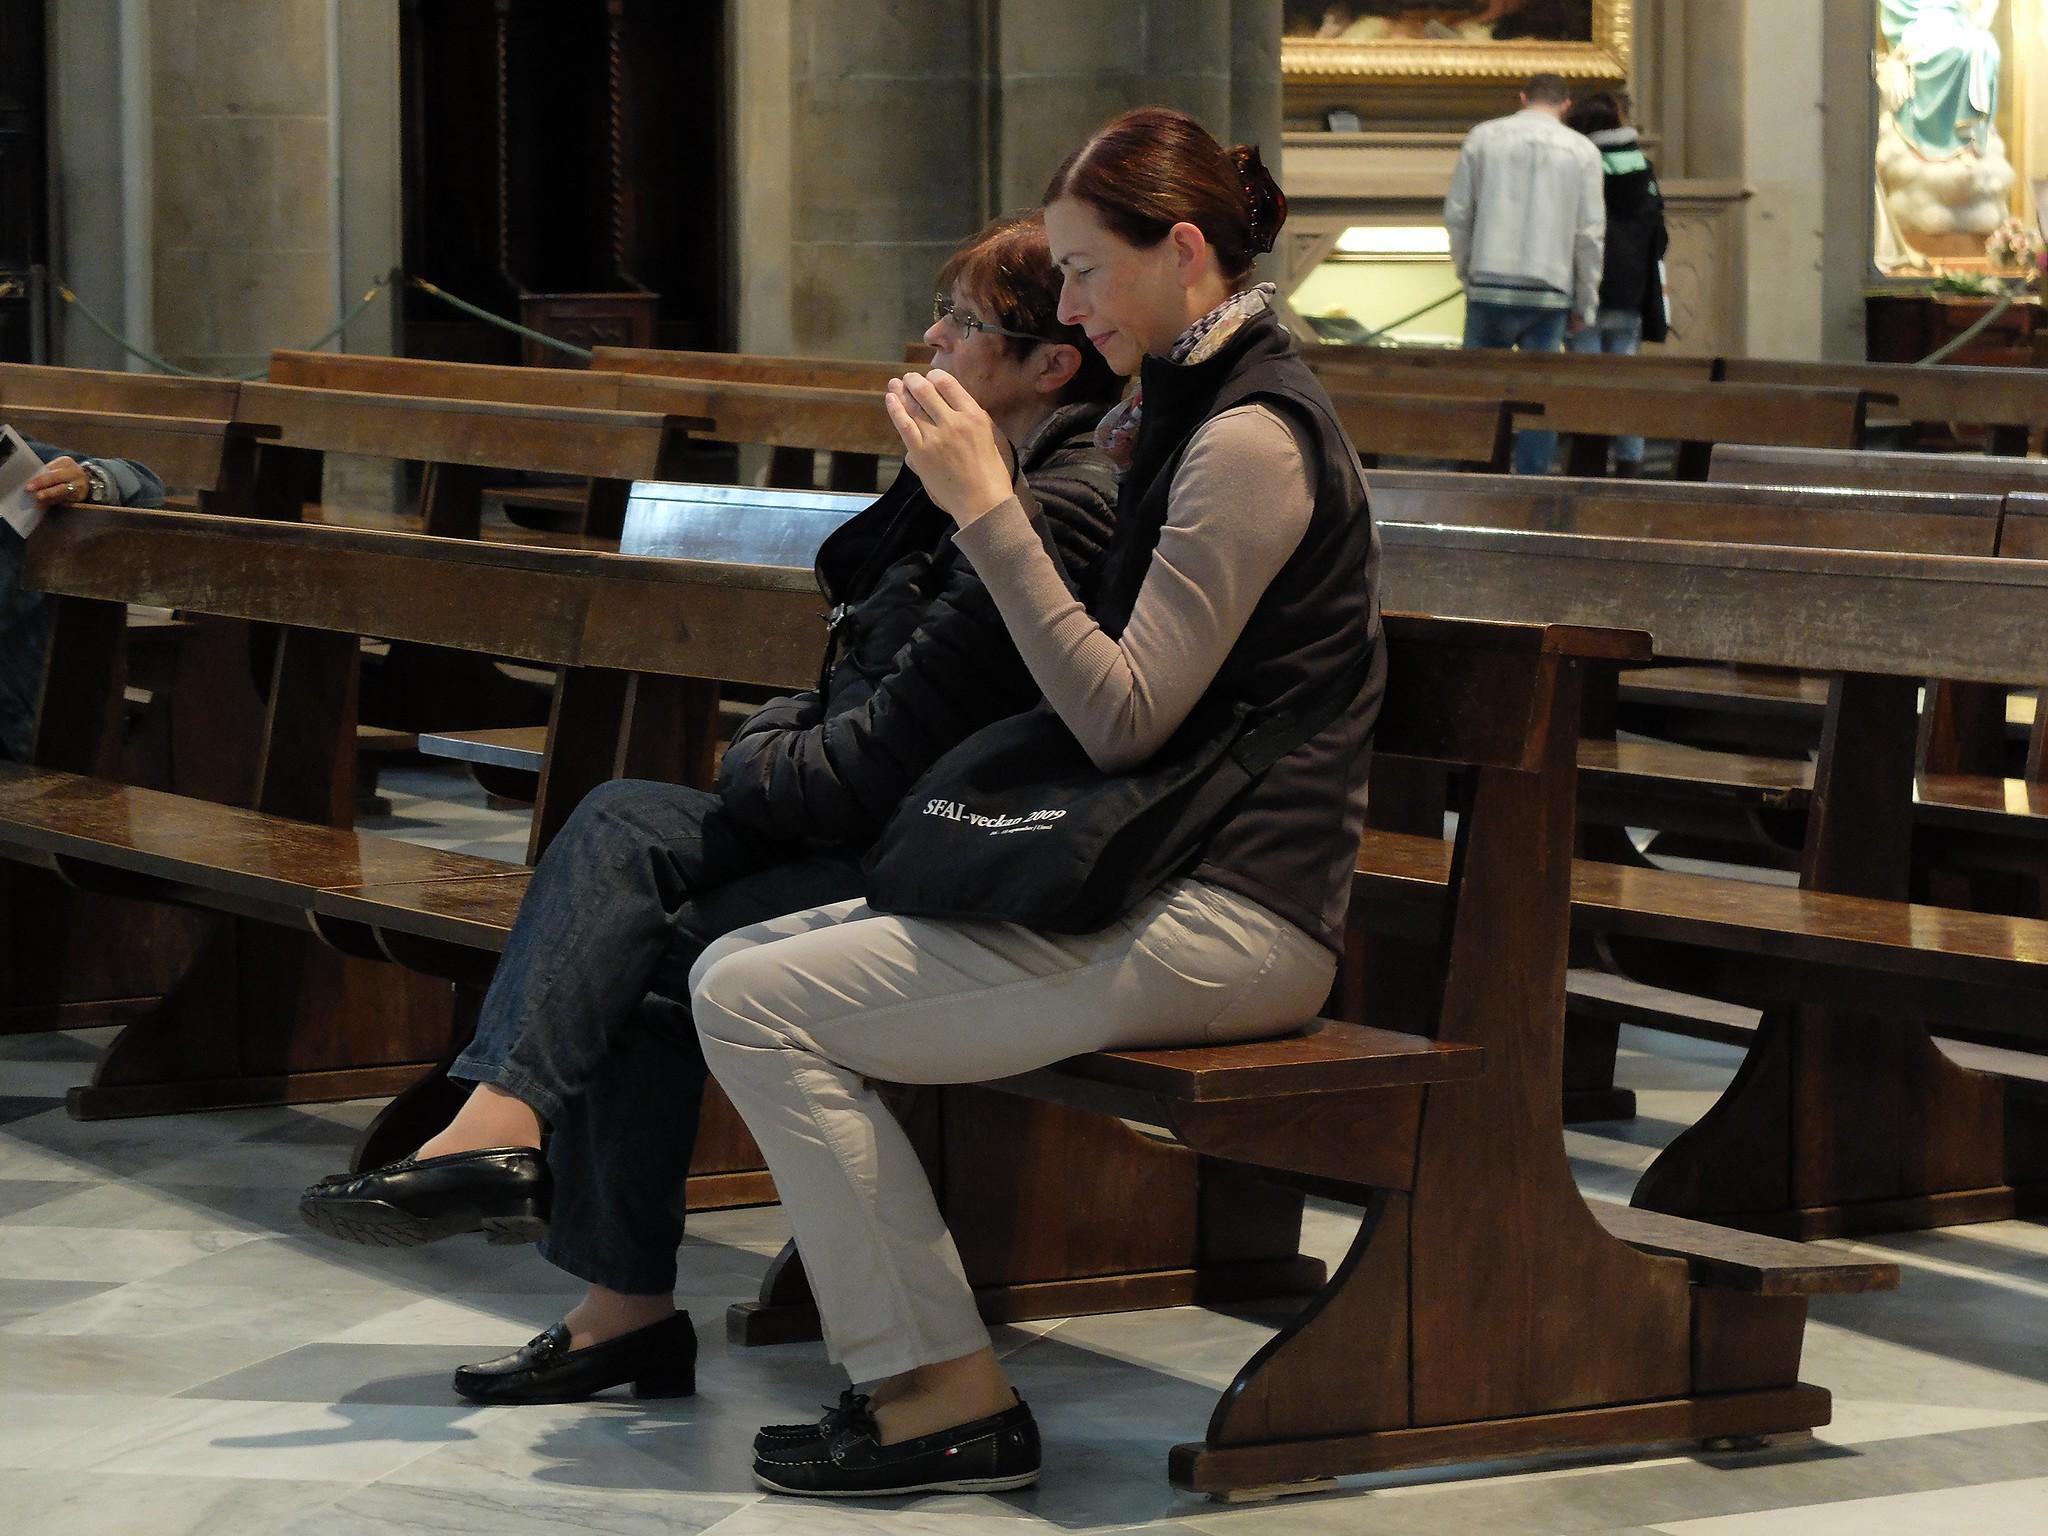 Florence_Santa-Maria-Novella_001